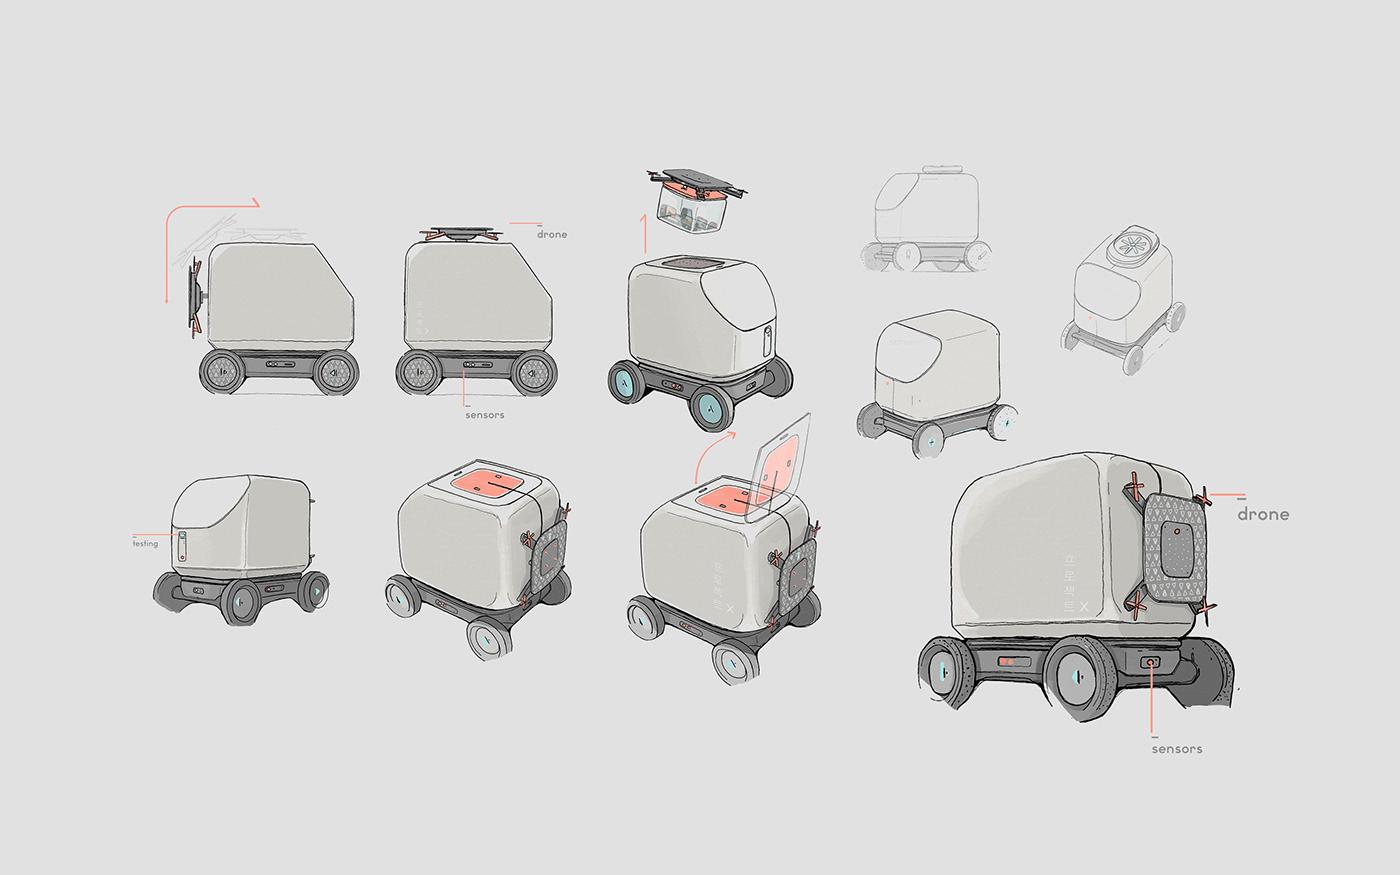 design industrial design  interaction product product design  Render